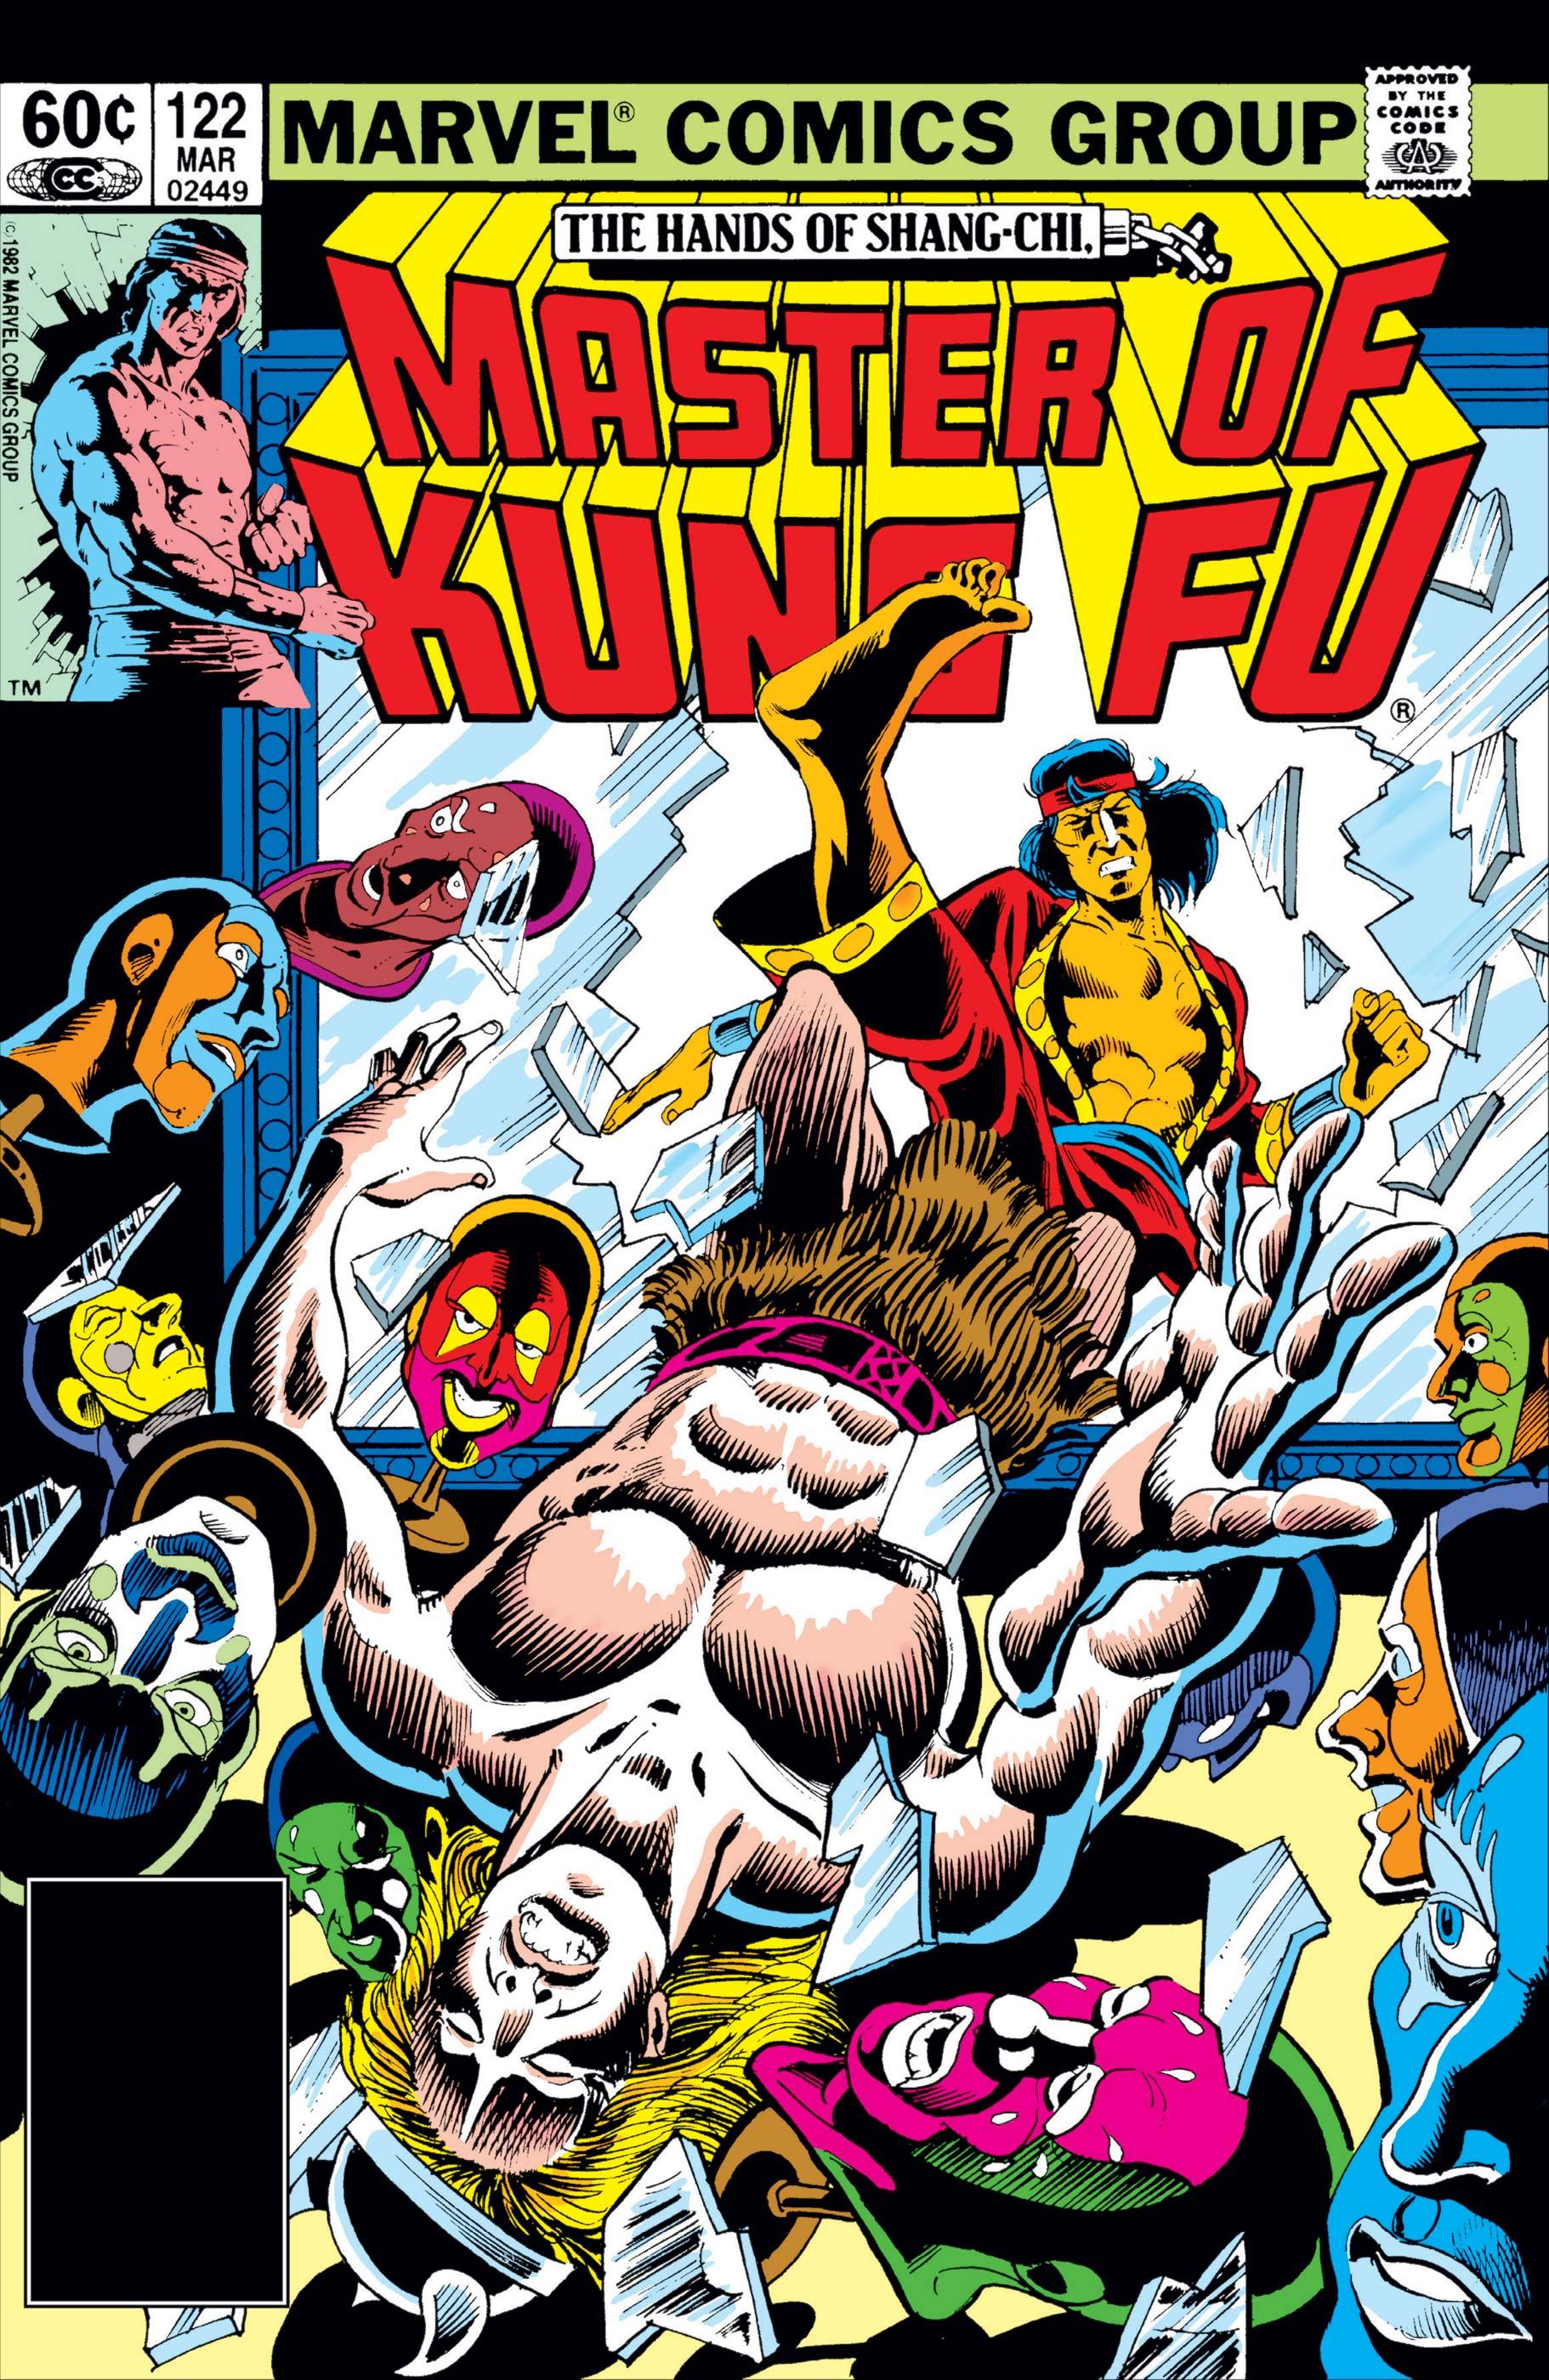 Master of Kung Fu (1974) #122